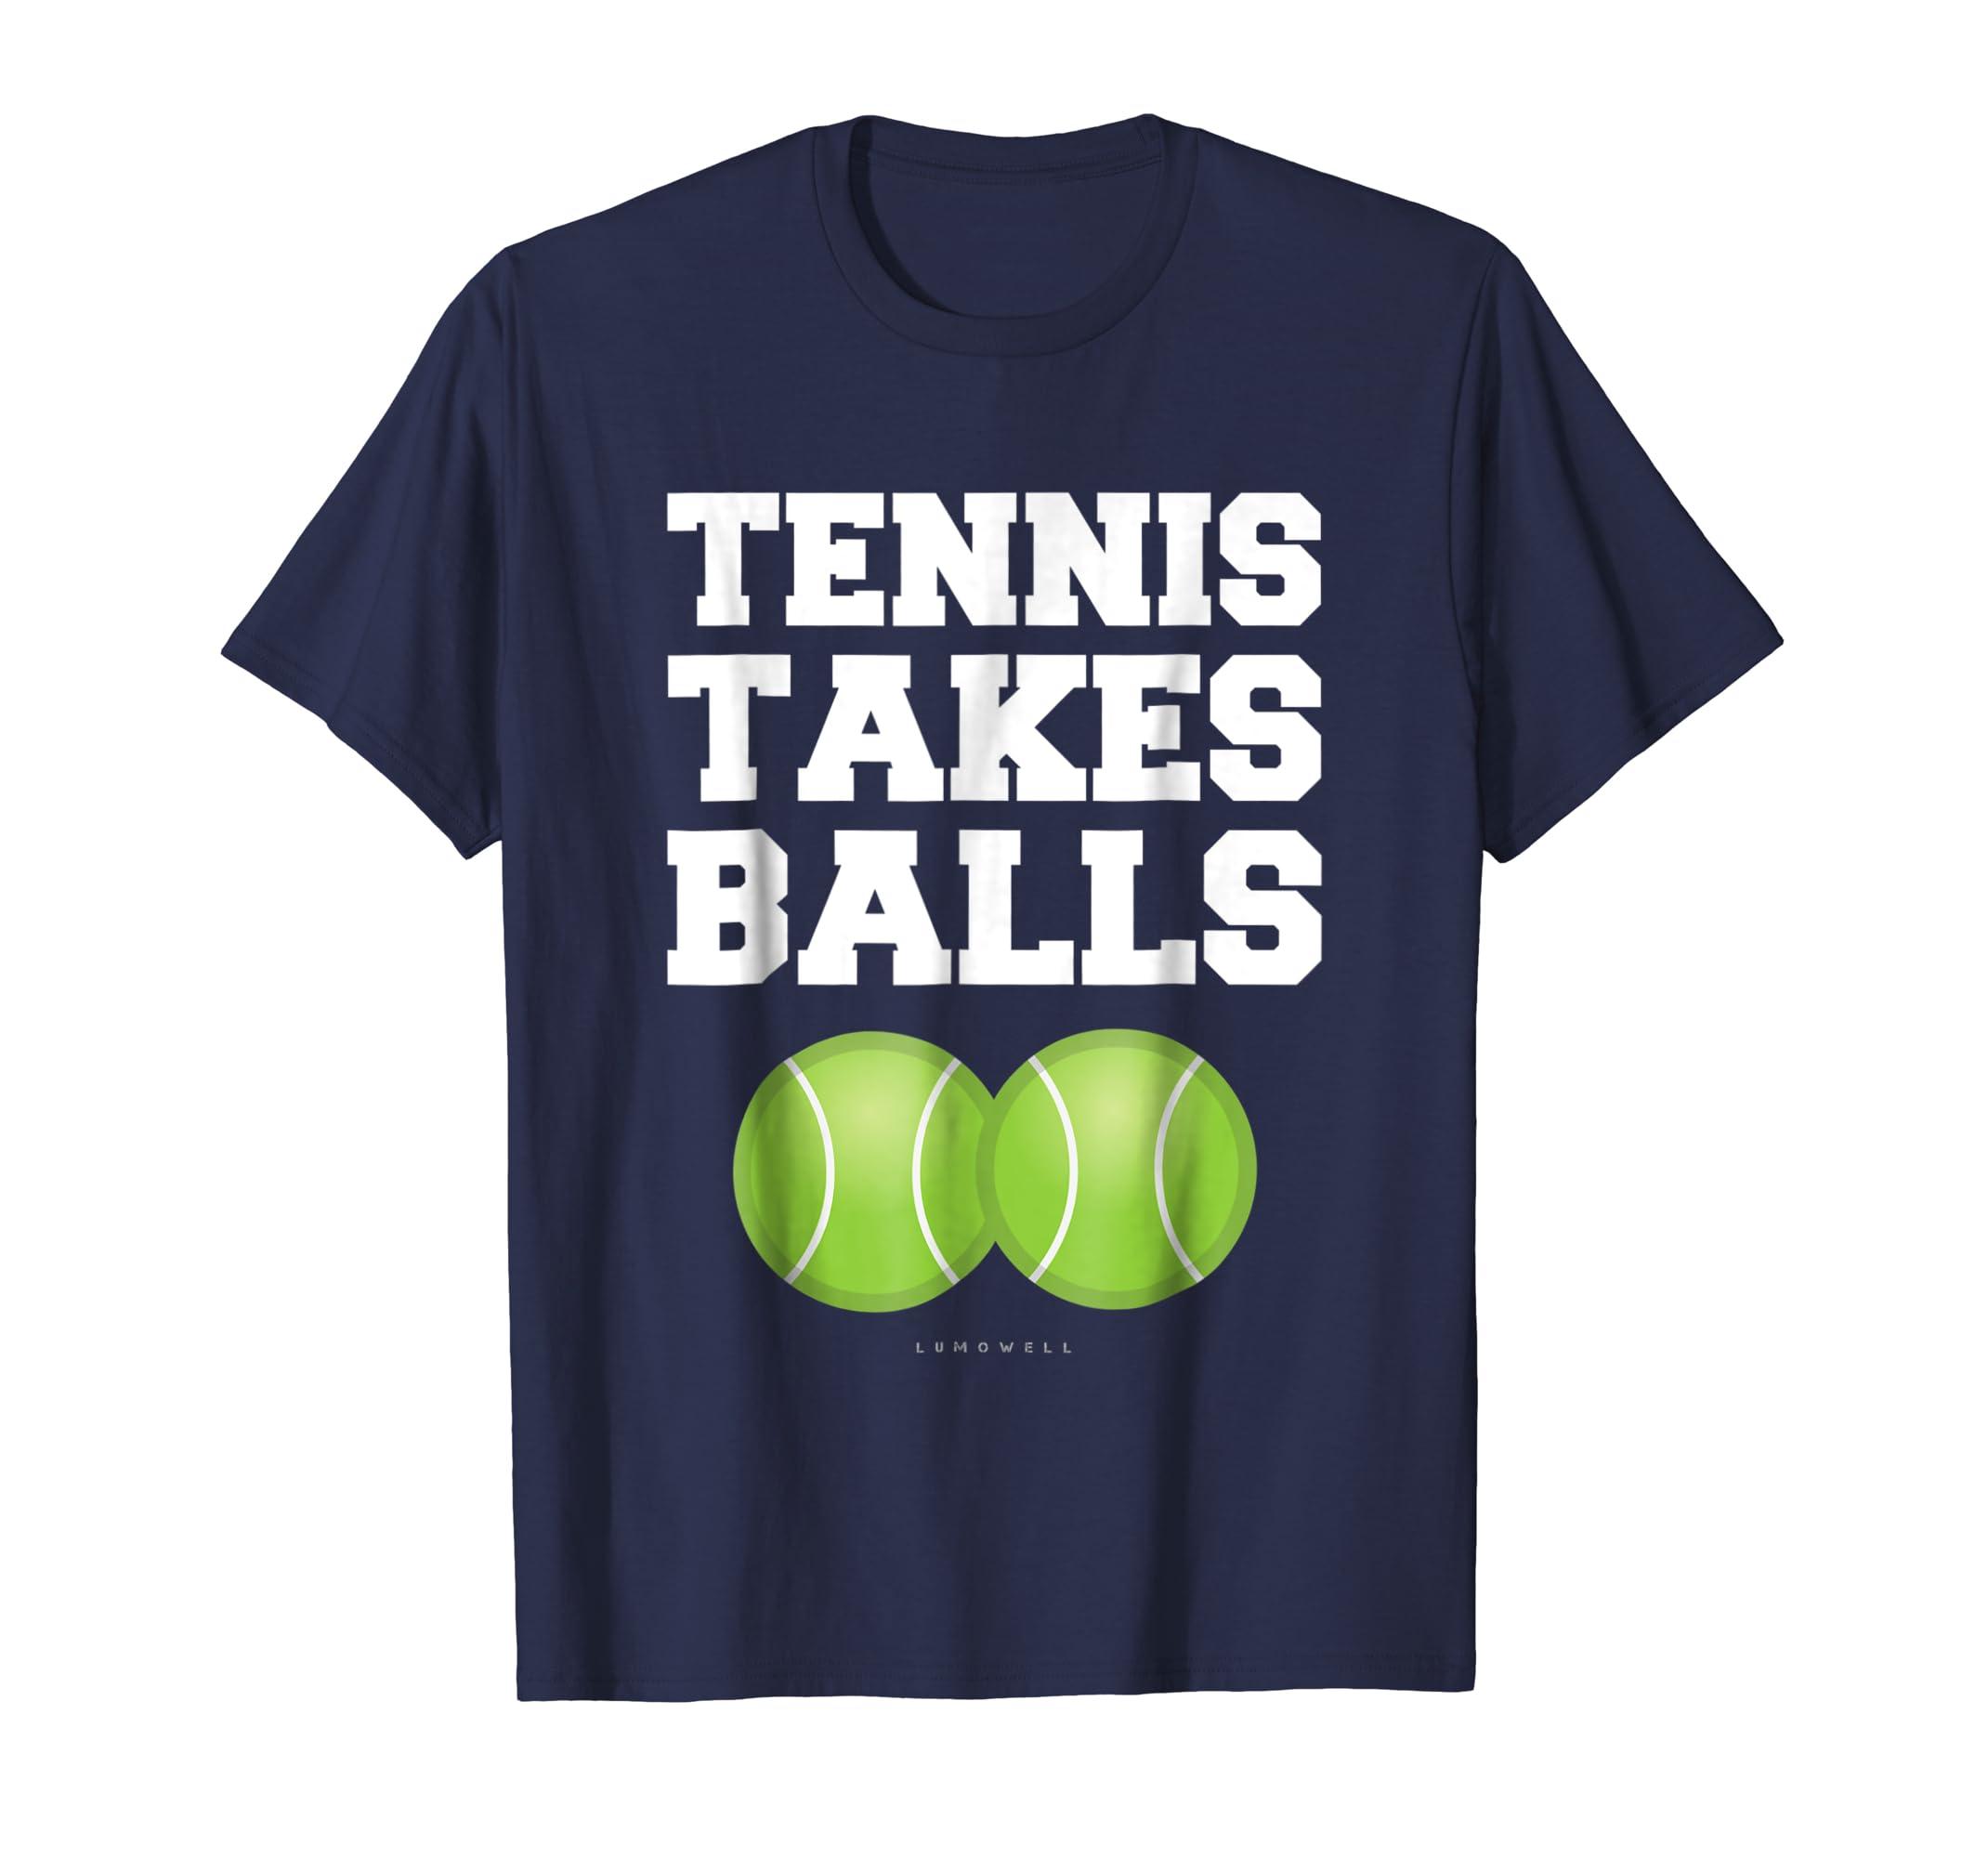 4a483450 Amazon.com: Tennis Takes Balls T-Shirt - Funny Tennis Gift Shirts: Clothing